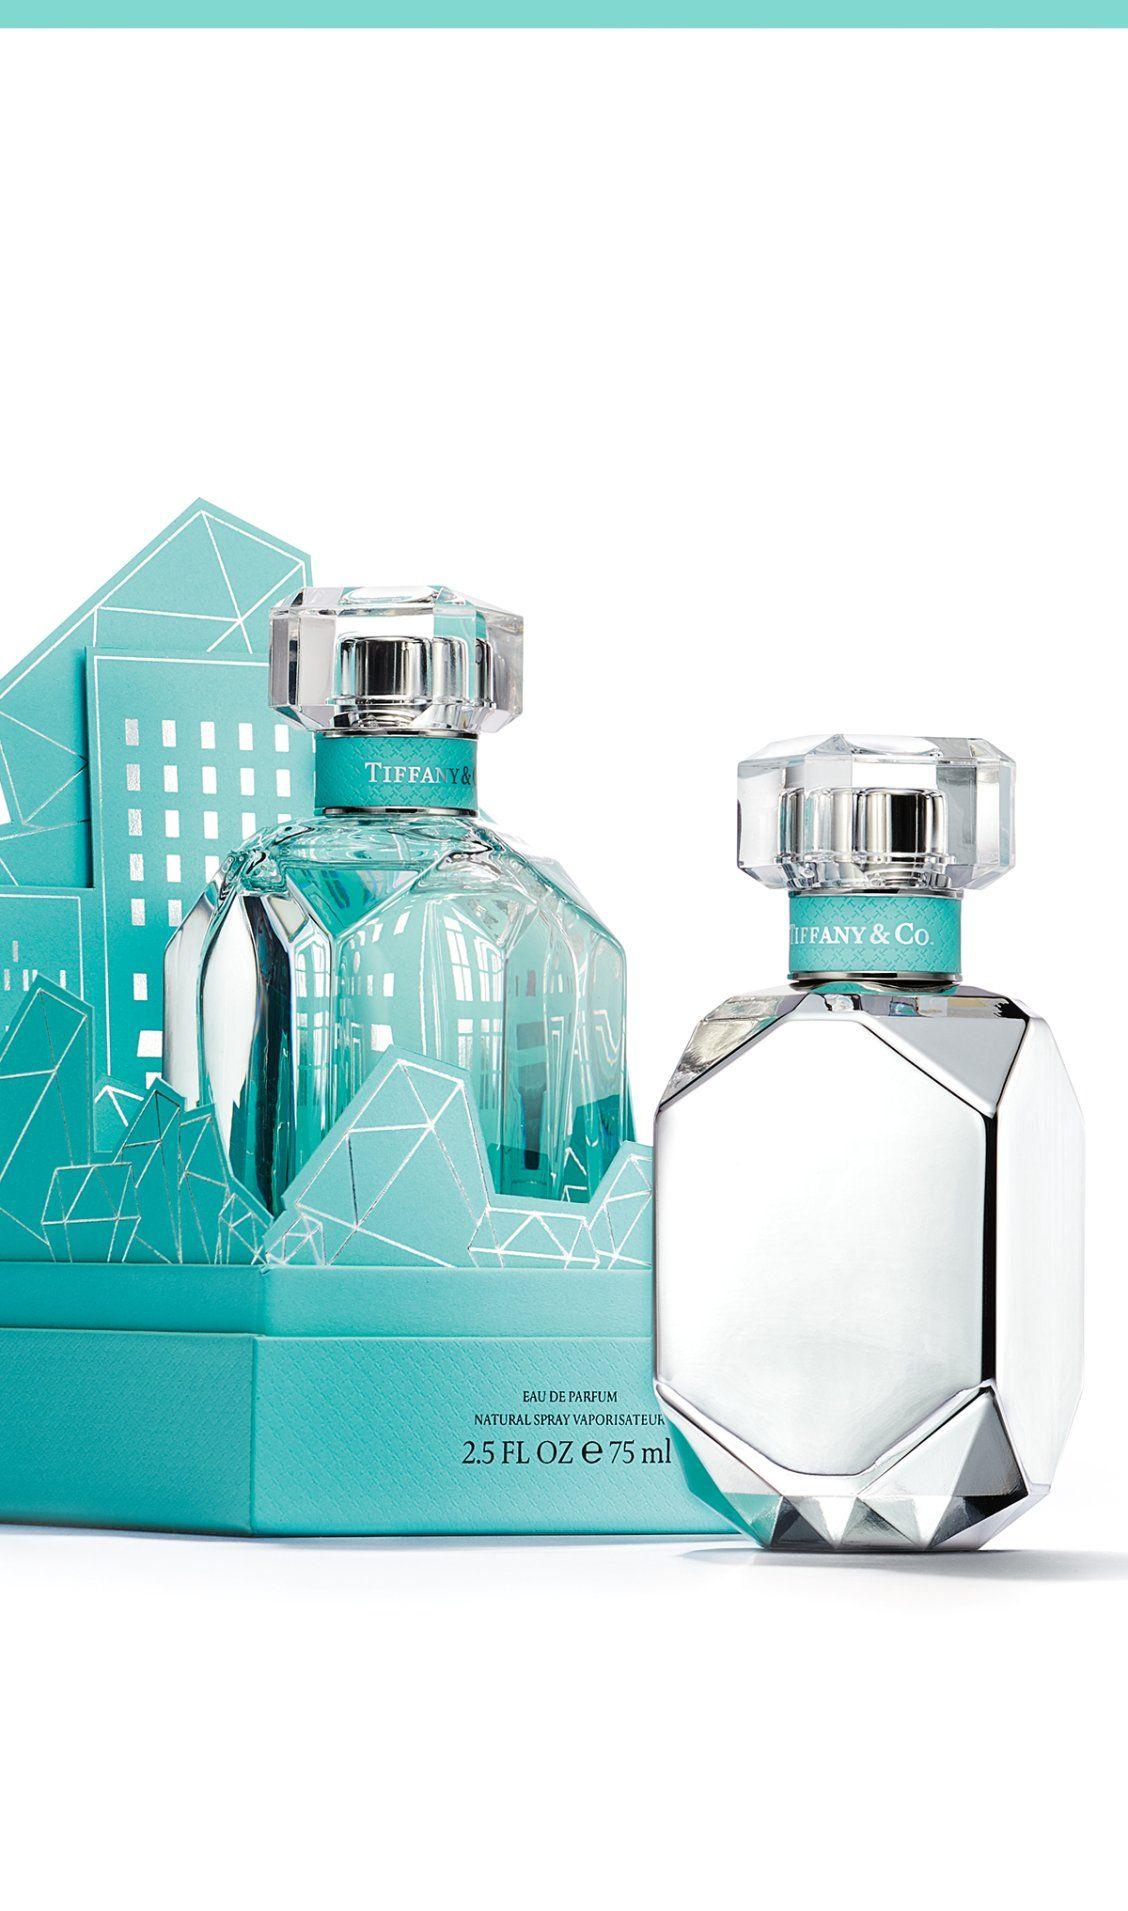 be404b698f1 Dream a little dream of Tiffany Intense Eau de Parfum and make the holidays  sweeter than ever. #TiffanyFragrance #TiffanyAndCo #Tiffany #ATiffanyHoliday